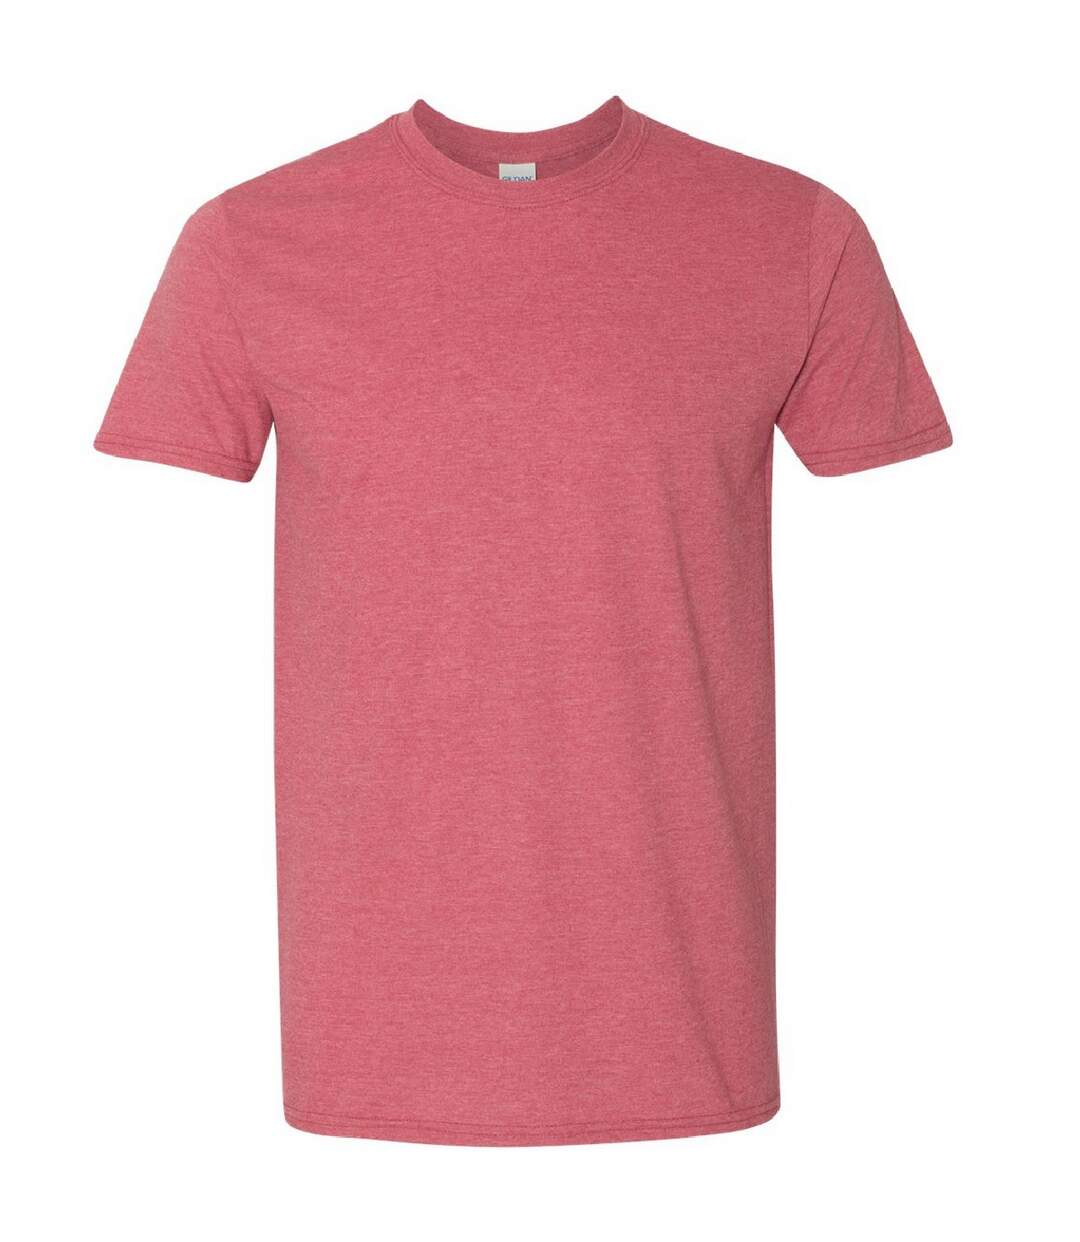 Gildan Mens Short Sleeve Soft-Style T-Shirt (Heather Cardinal) - UTBC484